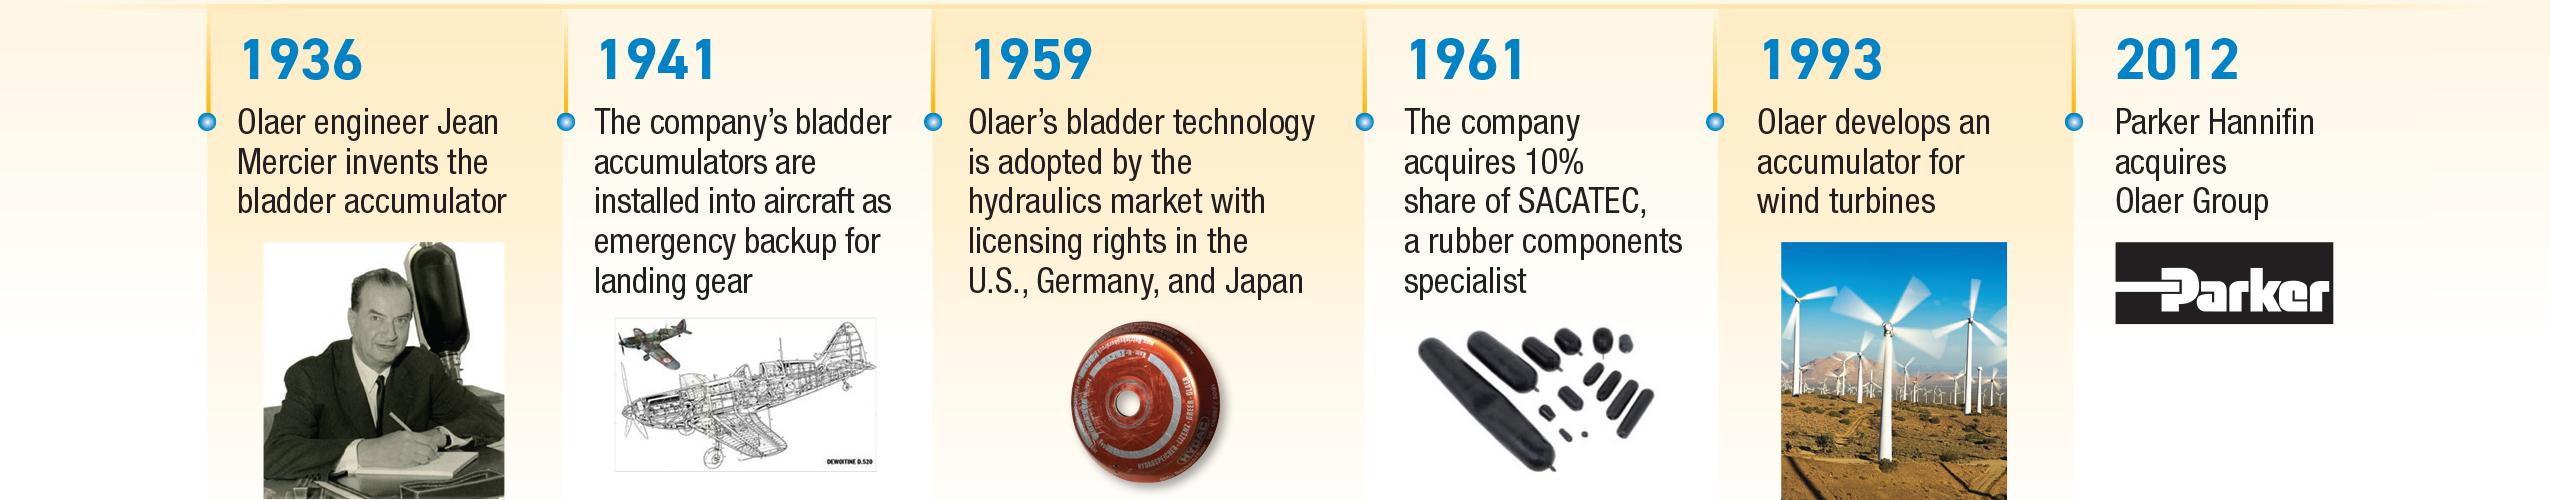 75+ years of accumulator innovation timeline